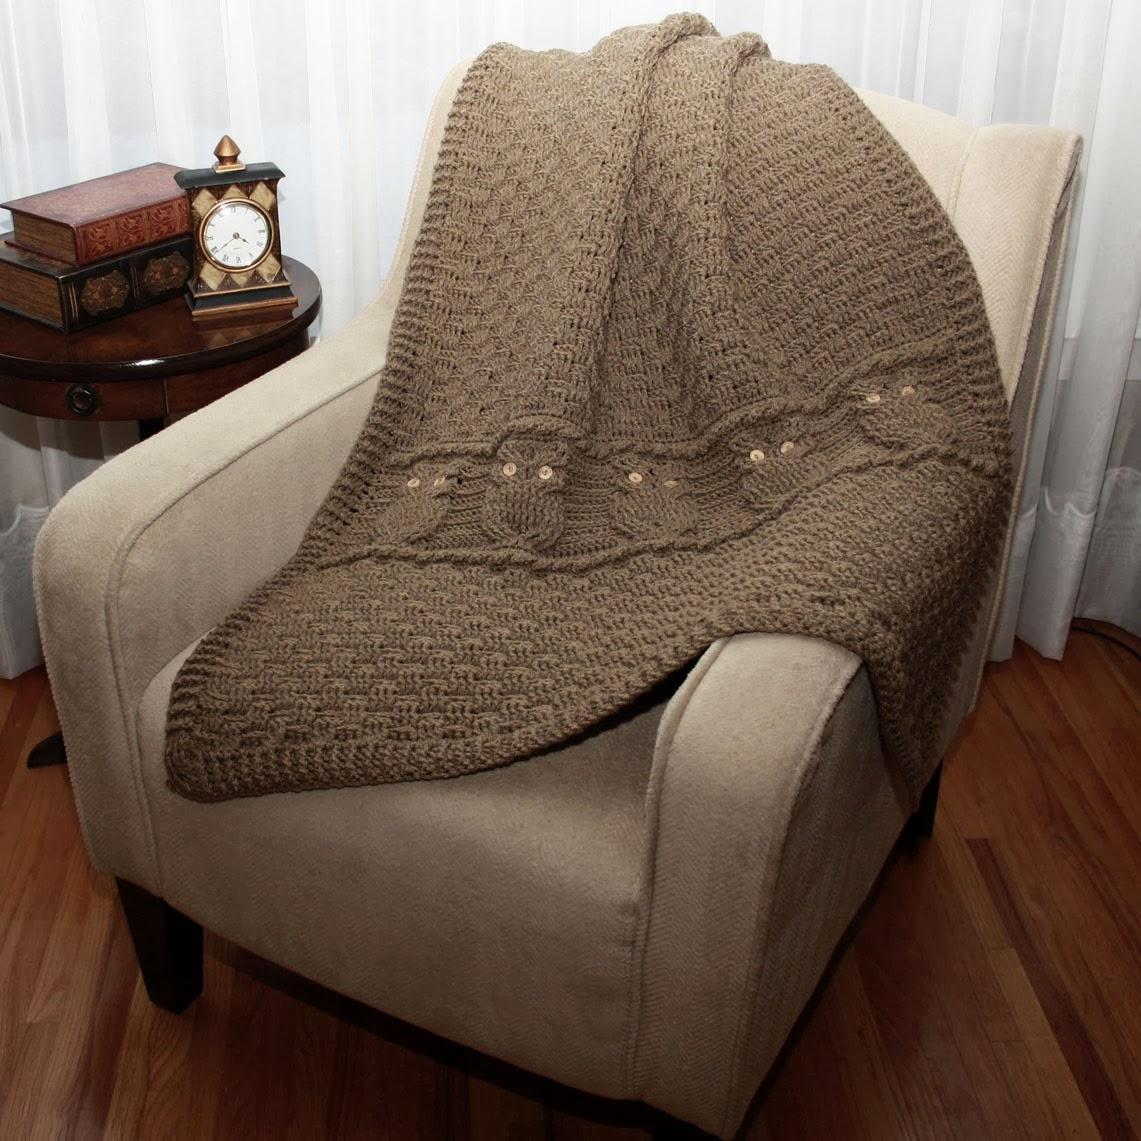 knot•sew•cute design shop: new crochet pattern - night owl ...